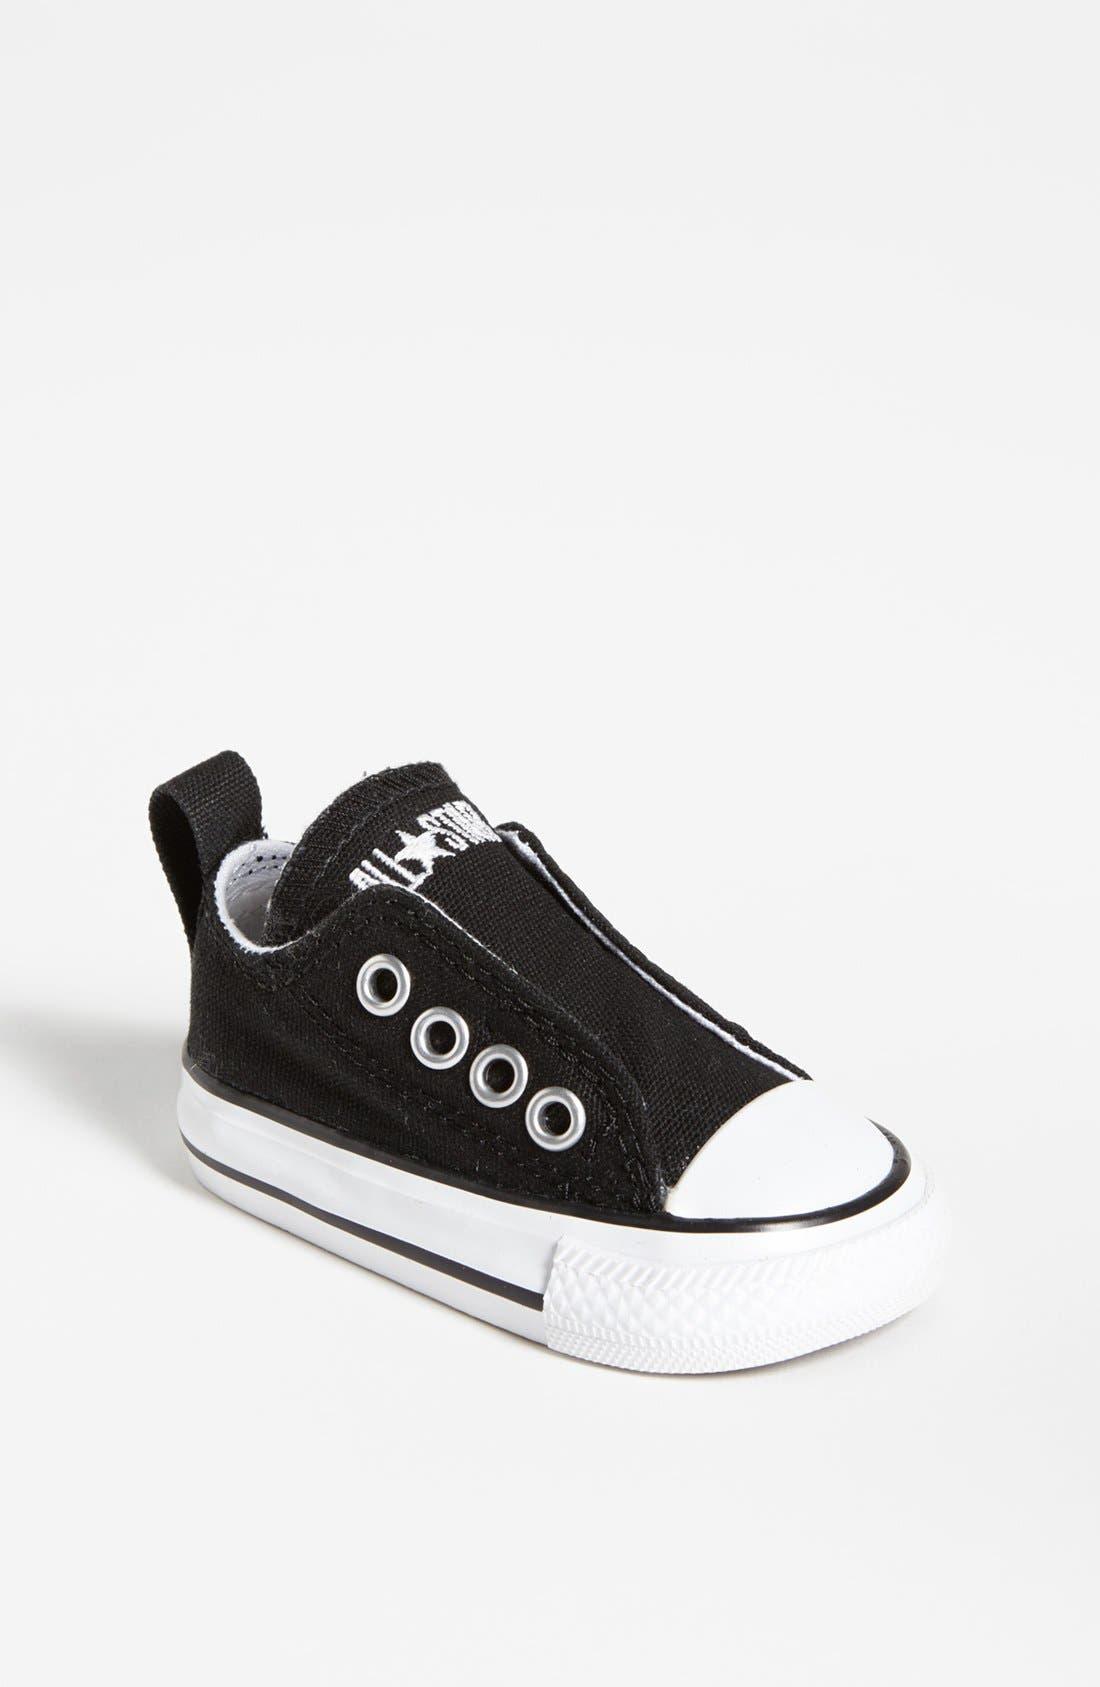 Infant Converse Chuck Taylor All Star Simple SlipOn Size 3 M  Black